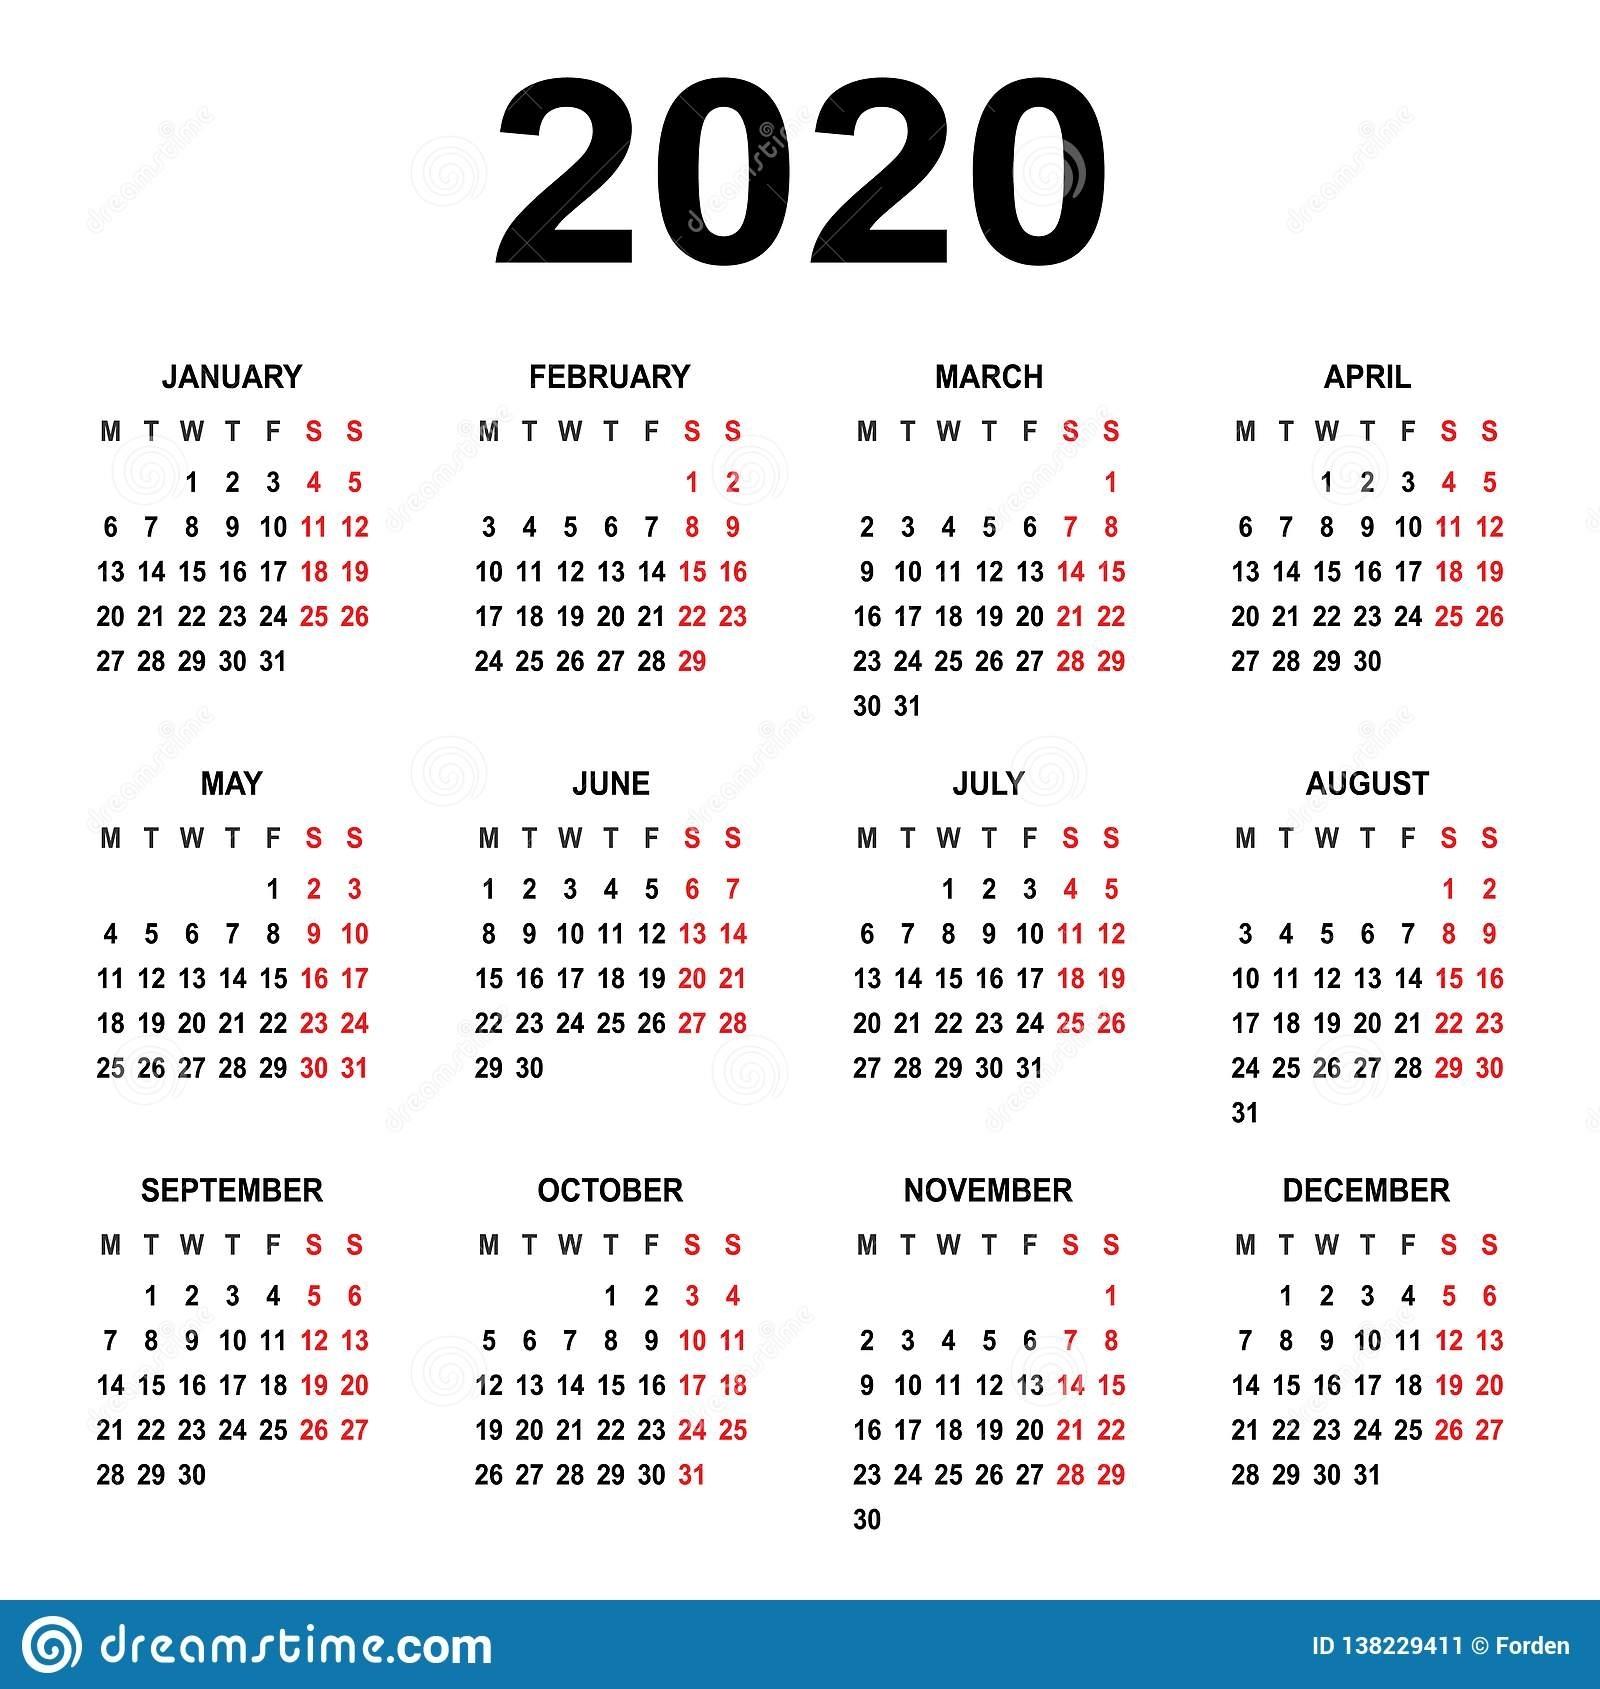 Calendar 2020. Week Starts On Monday. Basic Grid Stock pertaining to 2020 Calendar With Monday Start Week